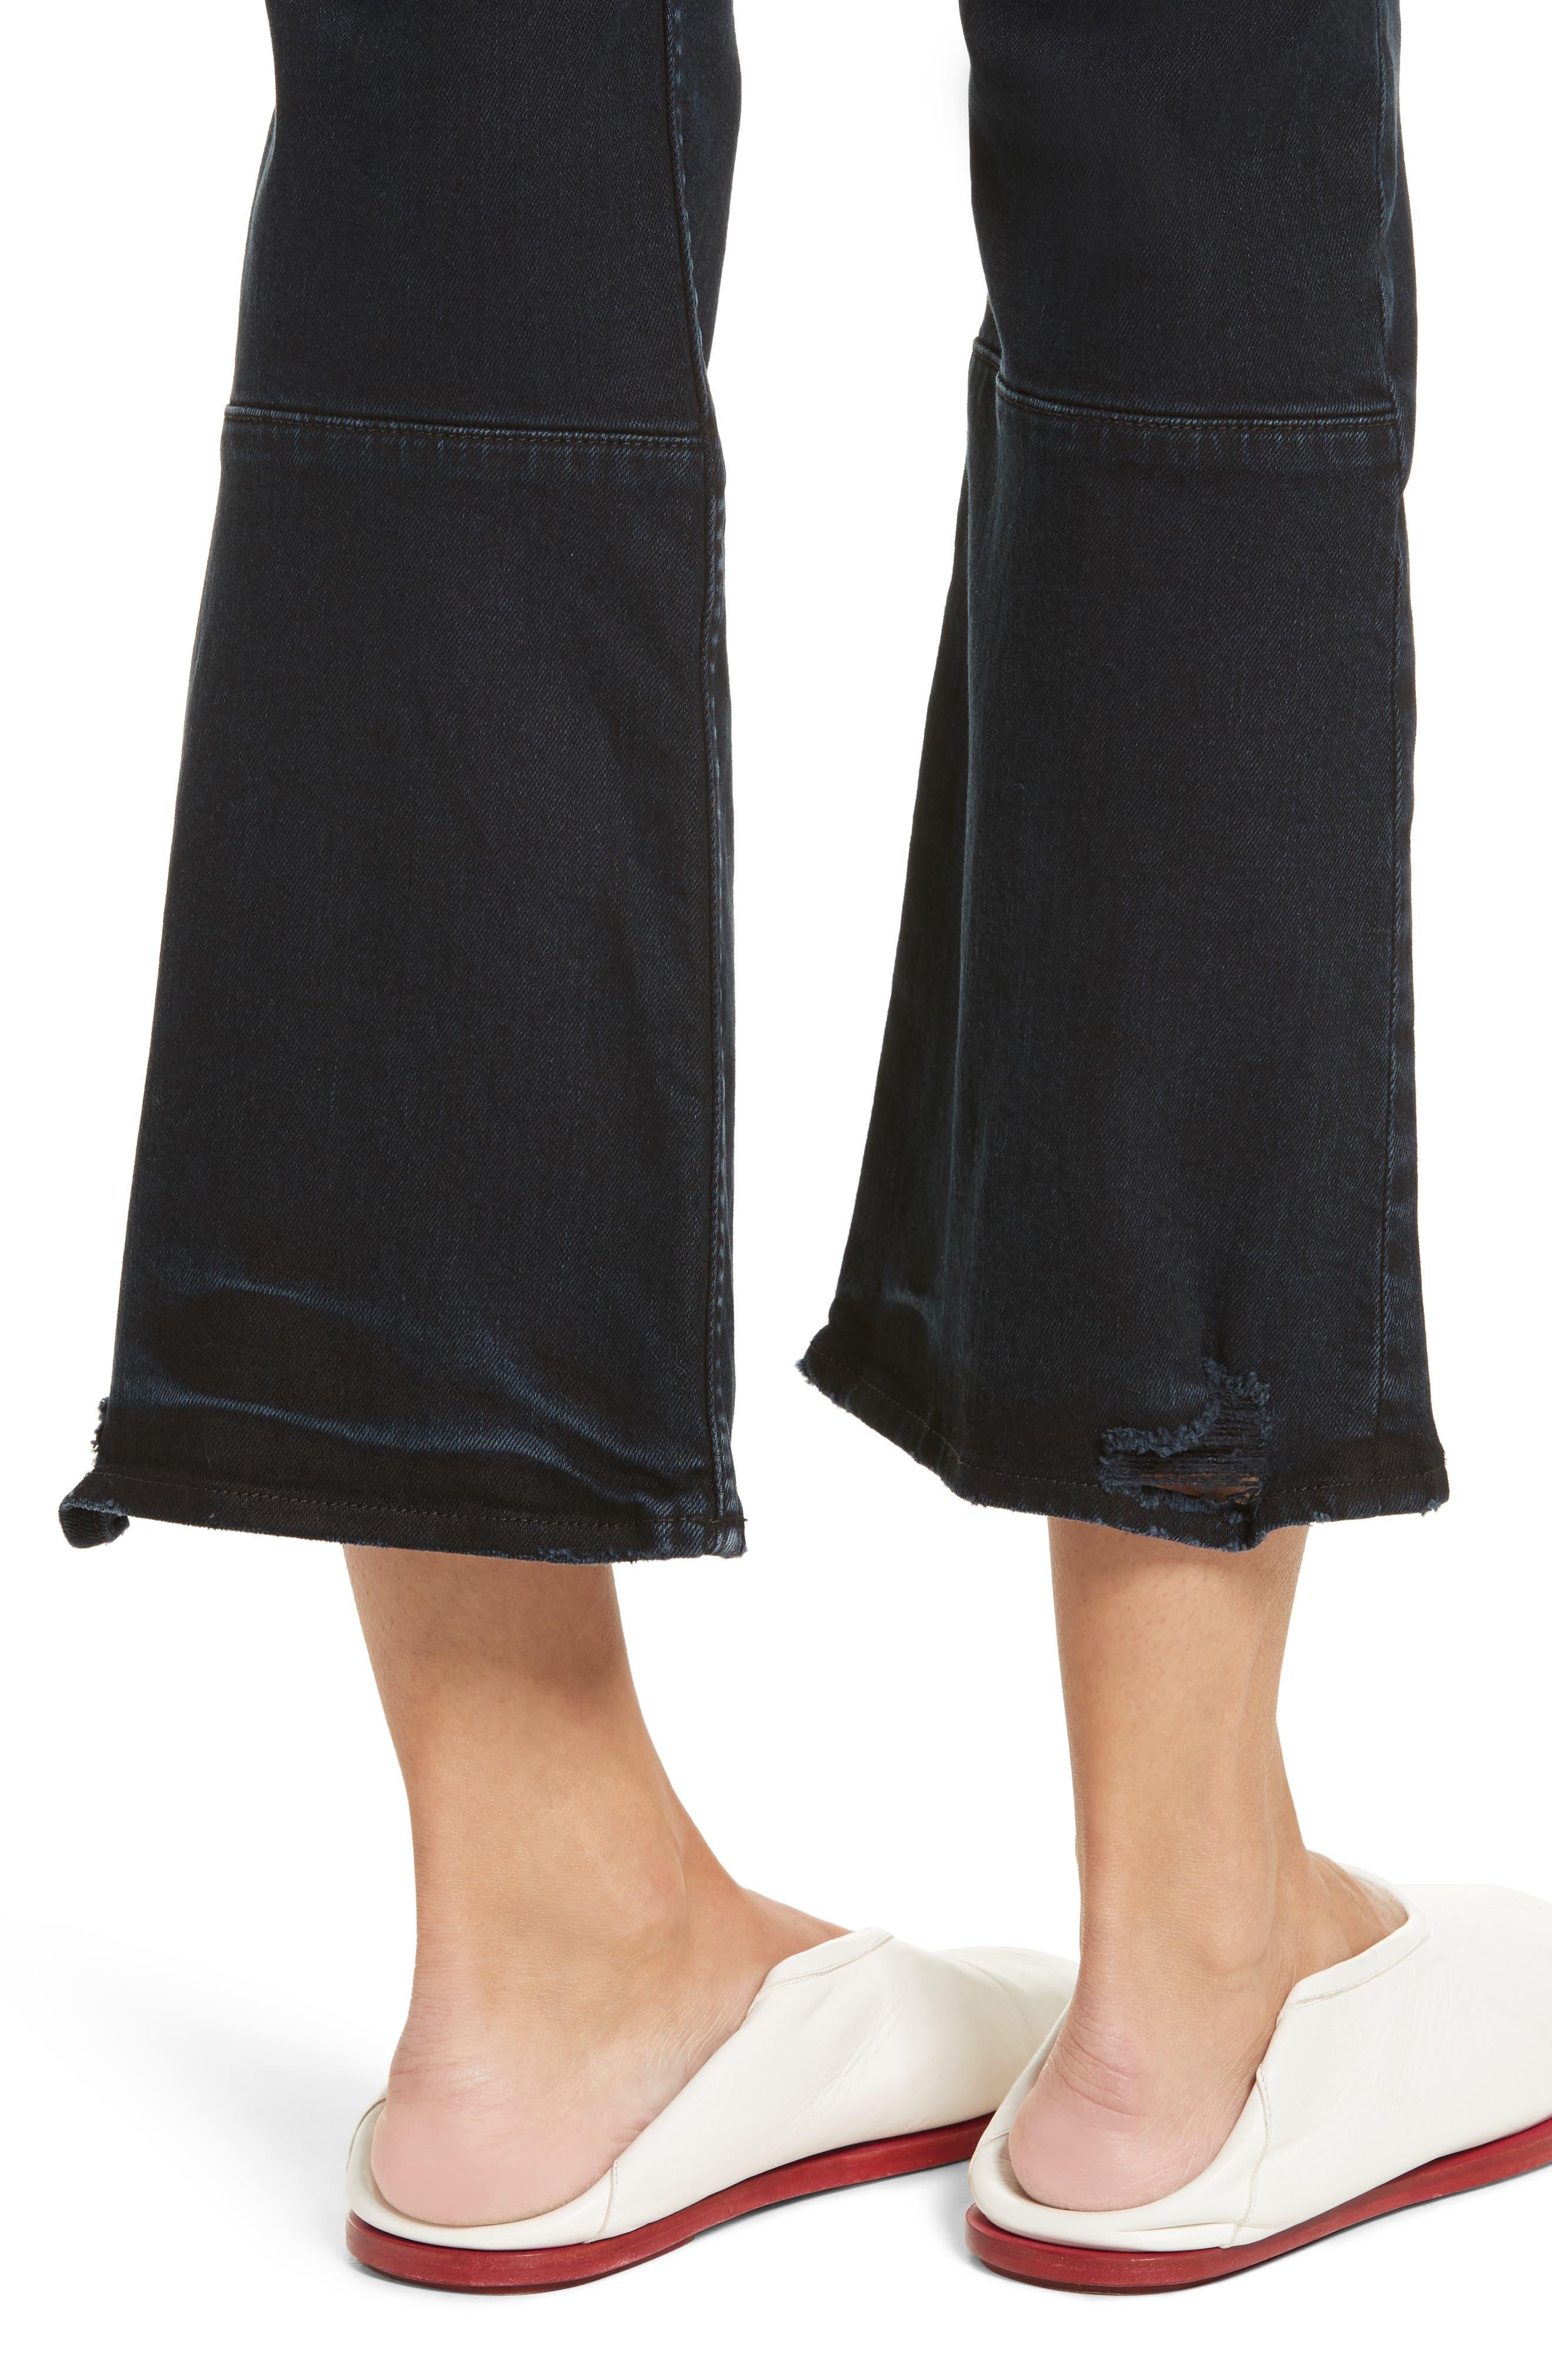 PSWL Crop Kick Flare Jeans,                             Alternate thumbnail 4, color,                             Stone Washed Black